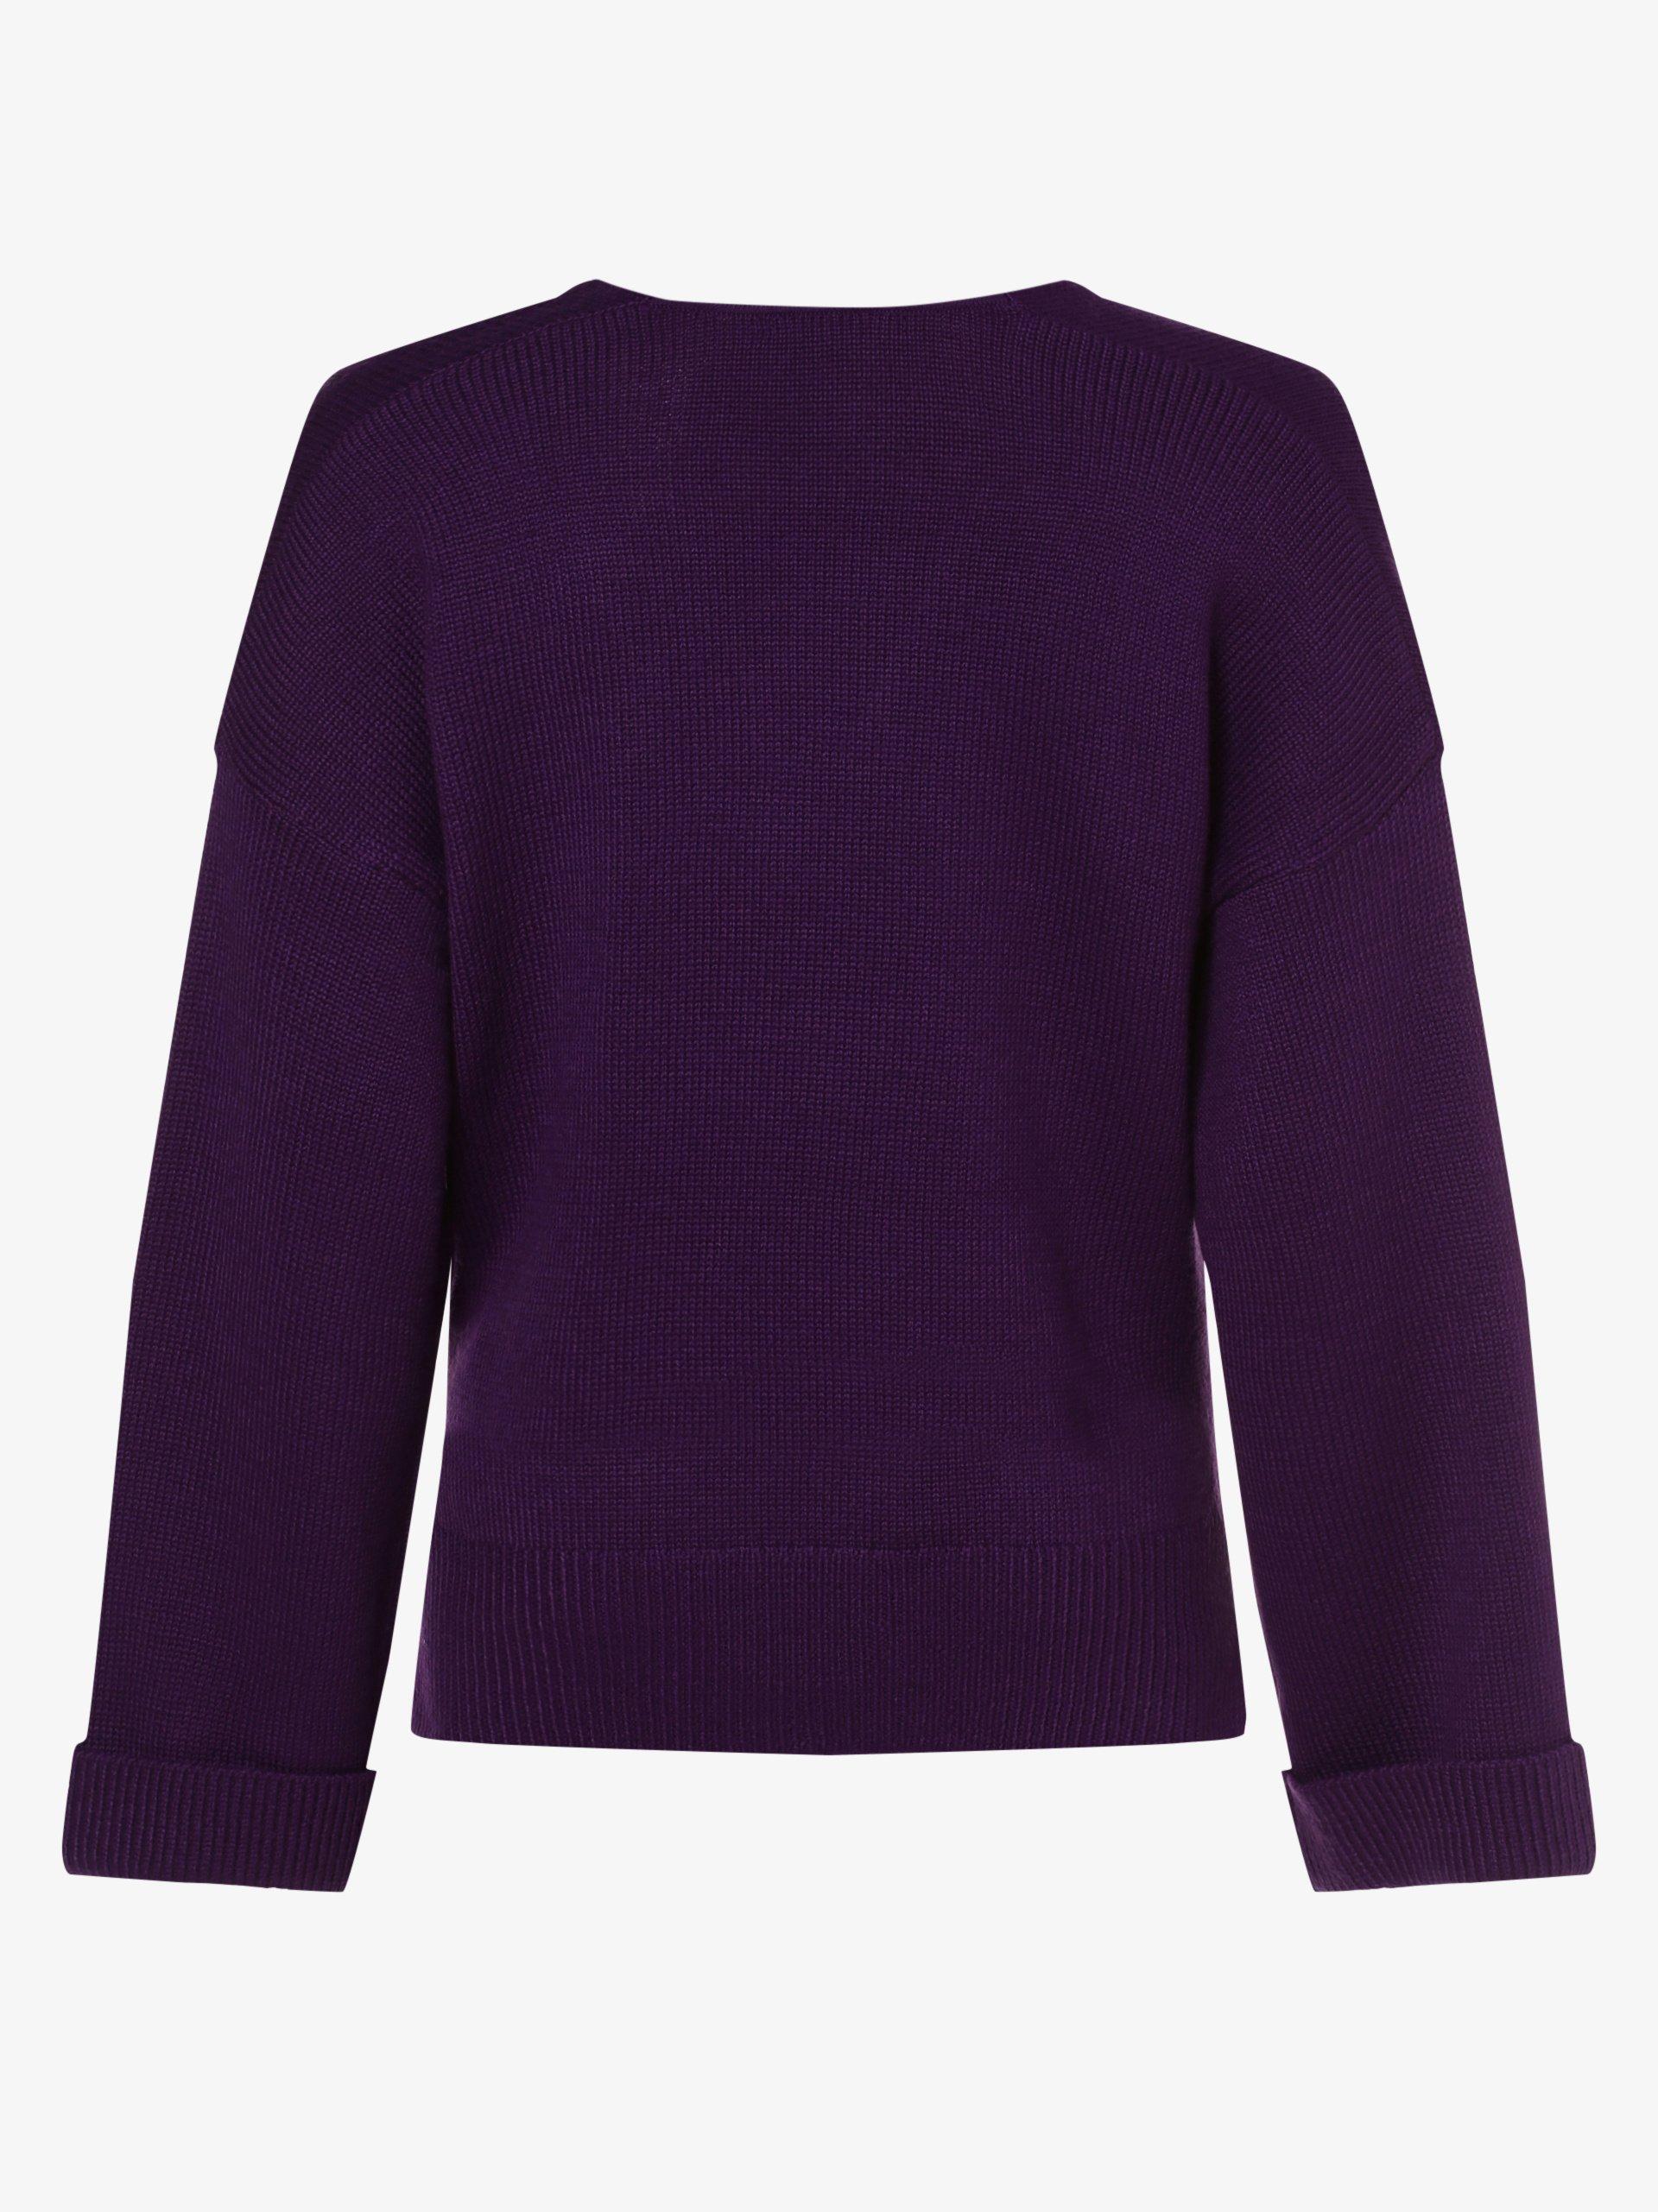 Someday Damen Pullover - Tibby